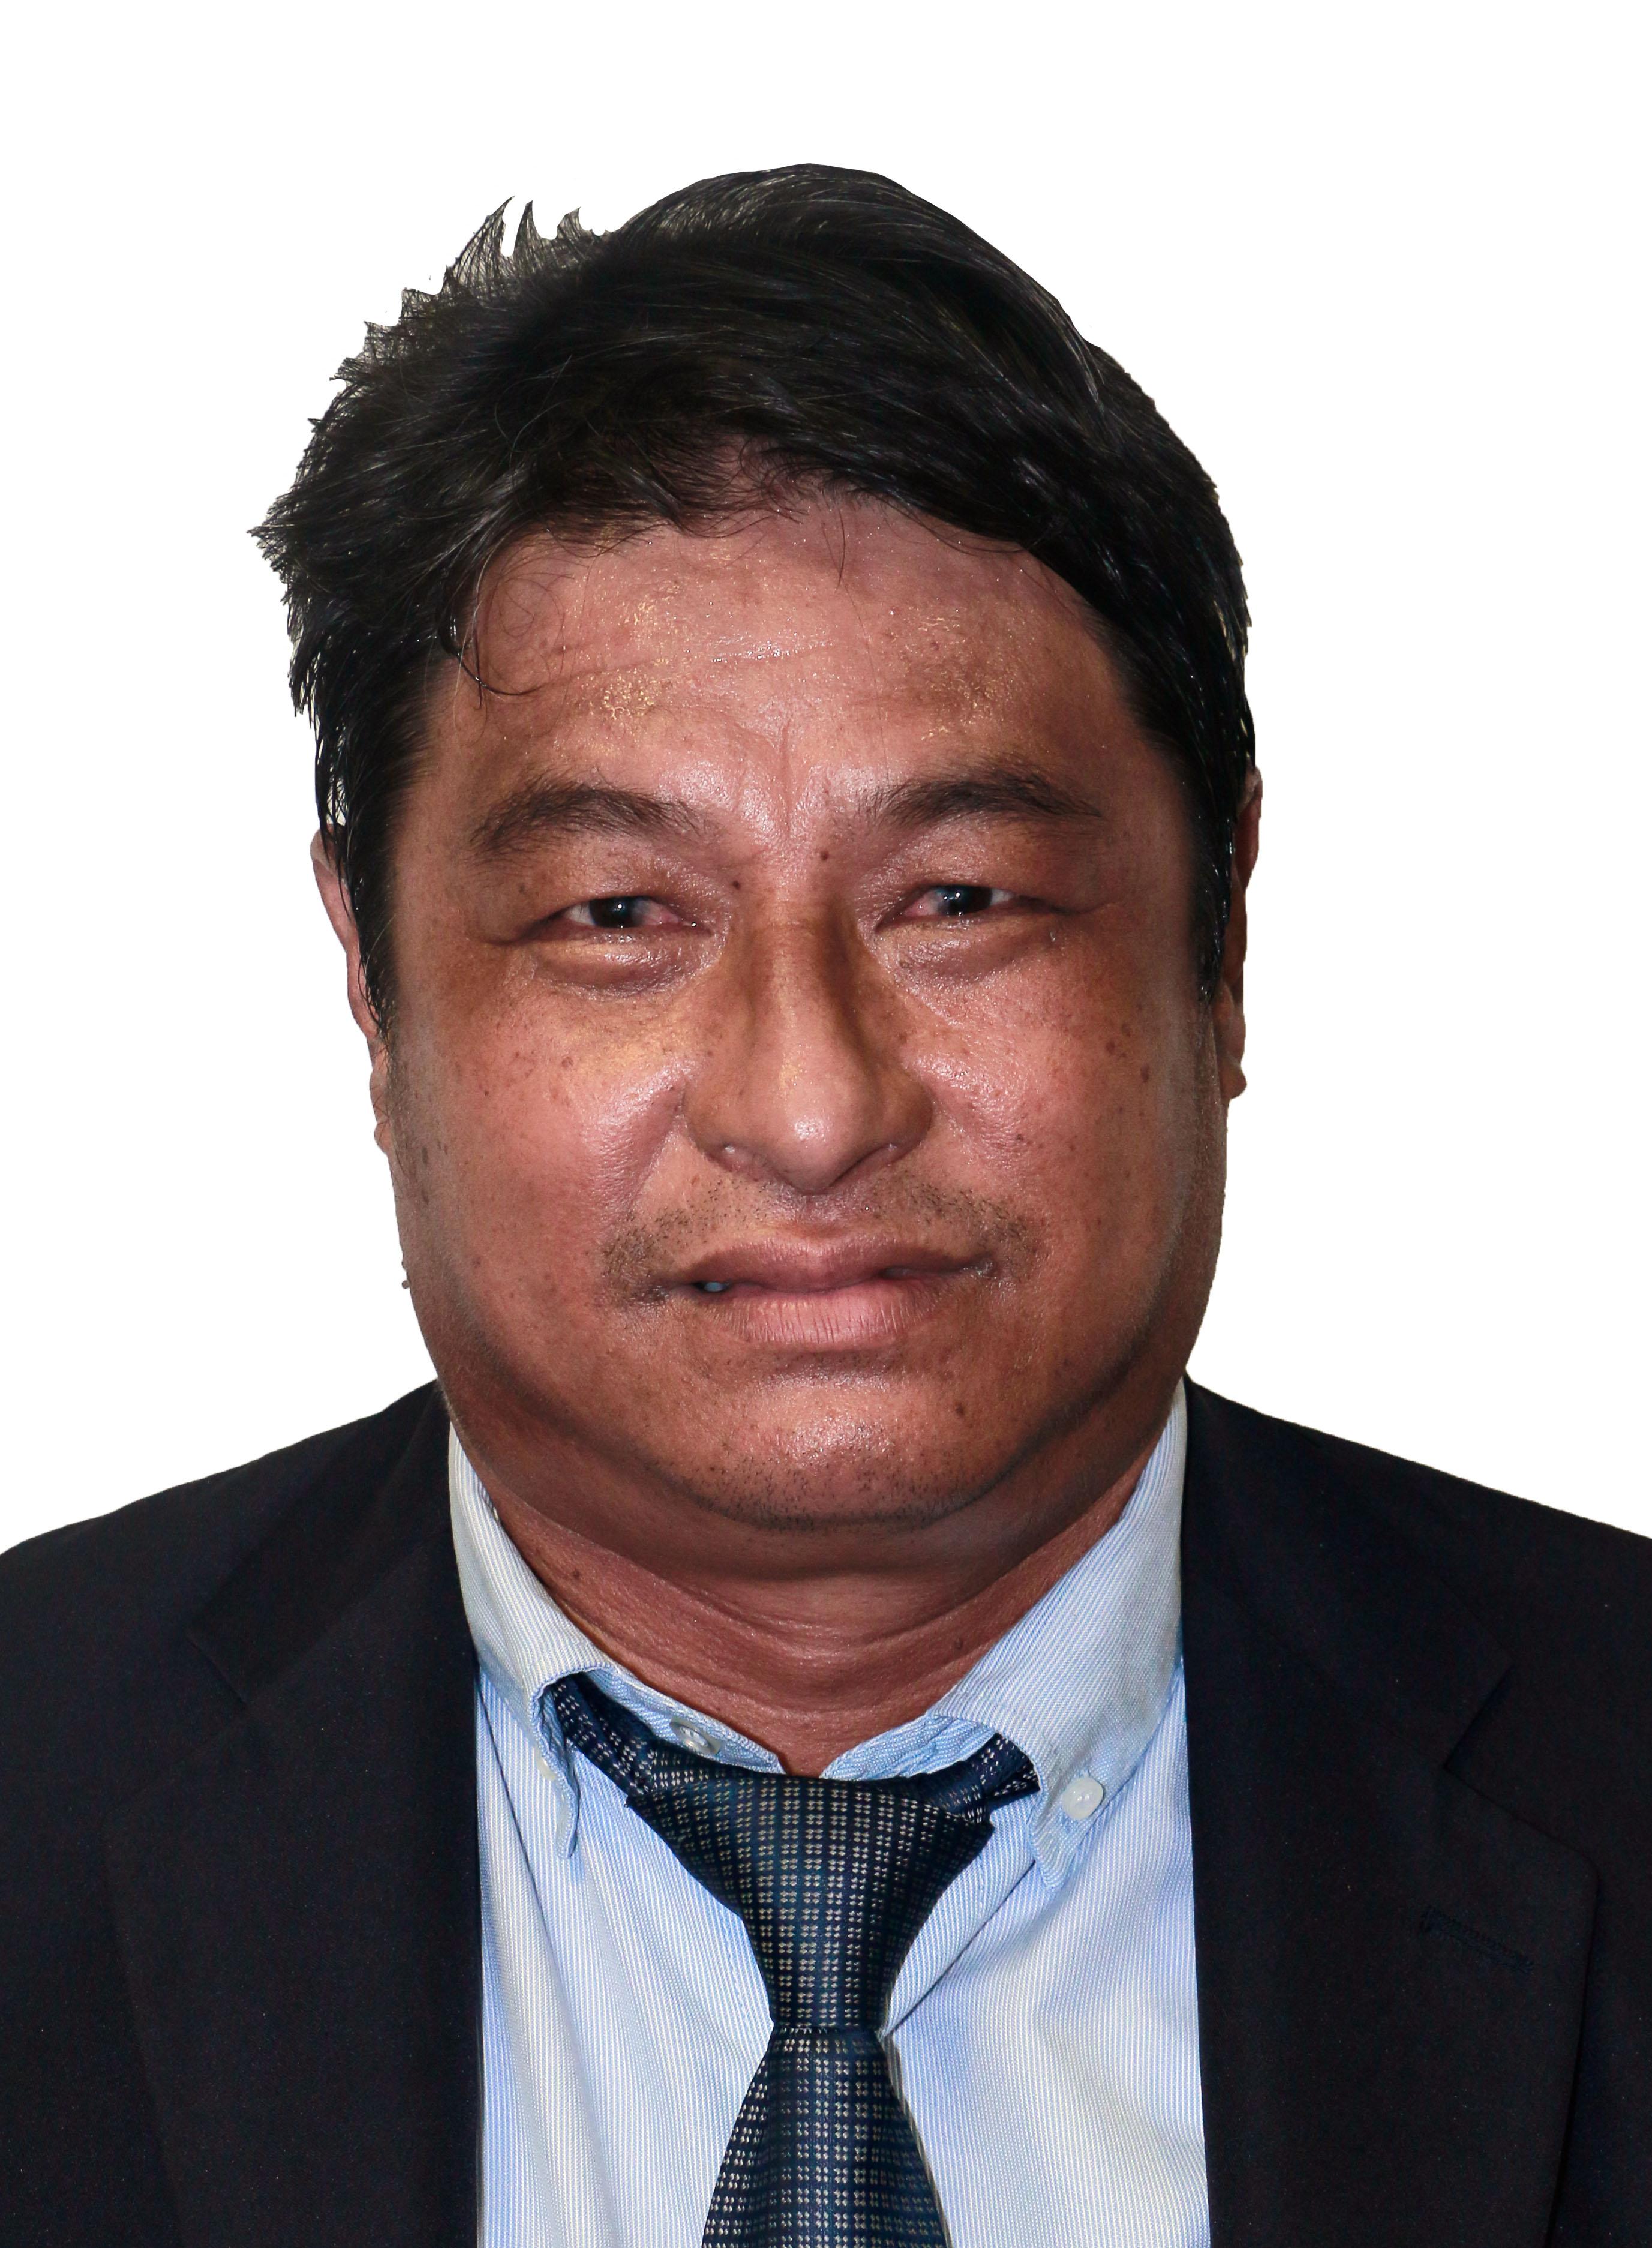 Arman Majid